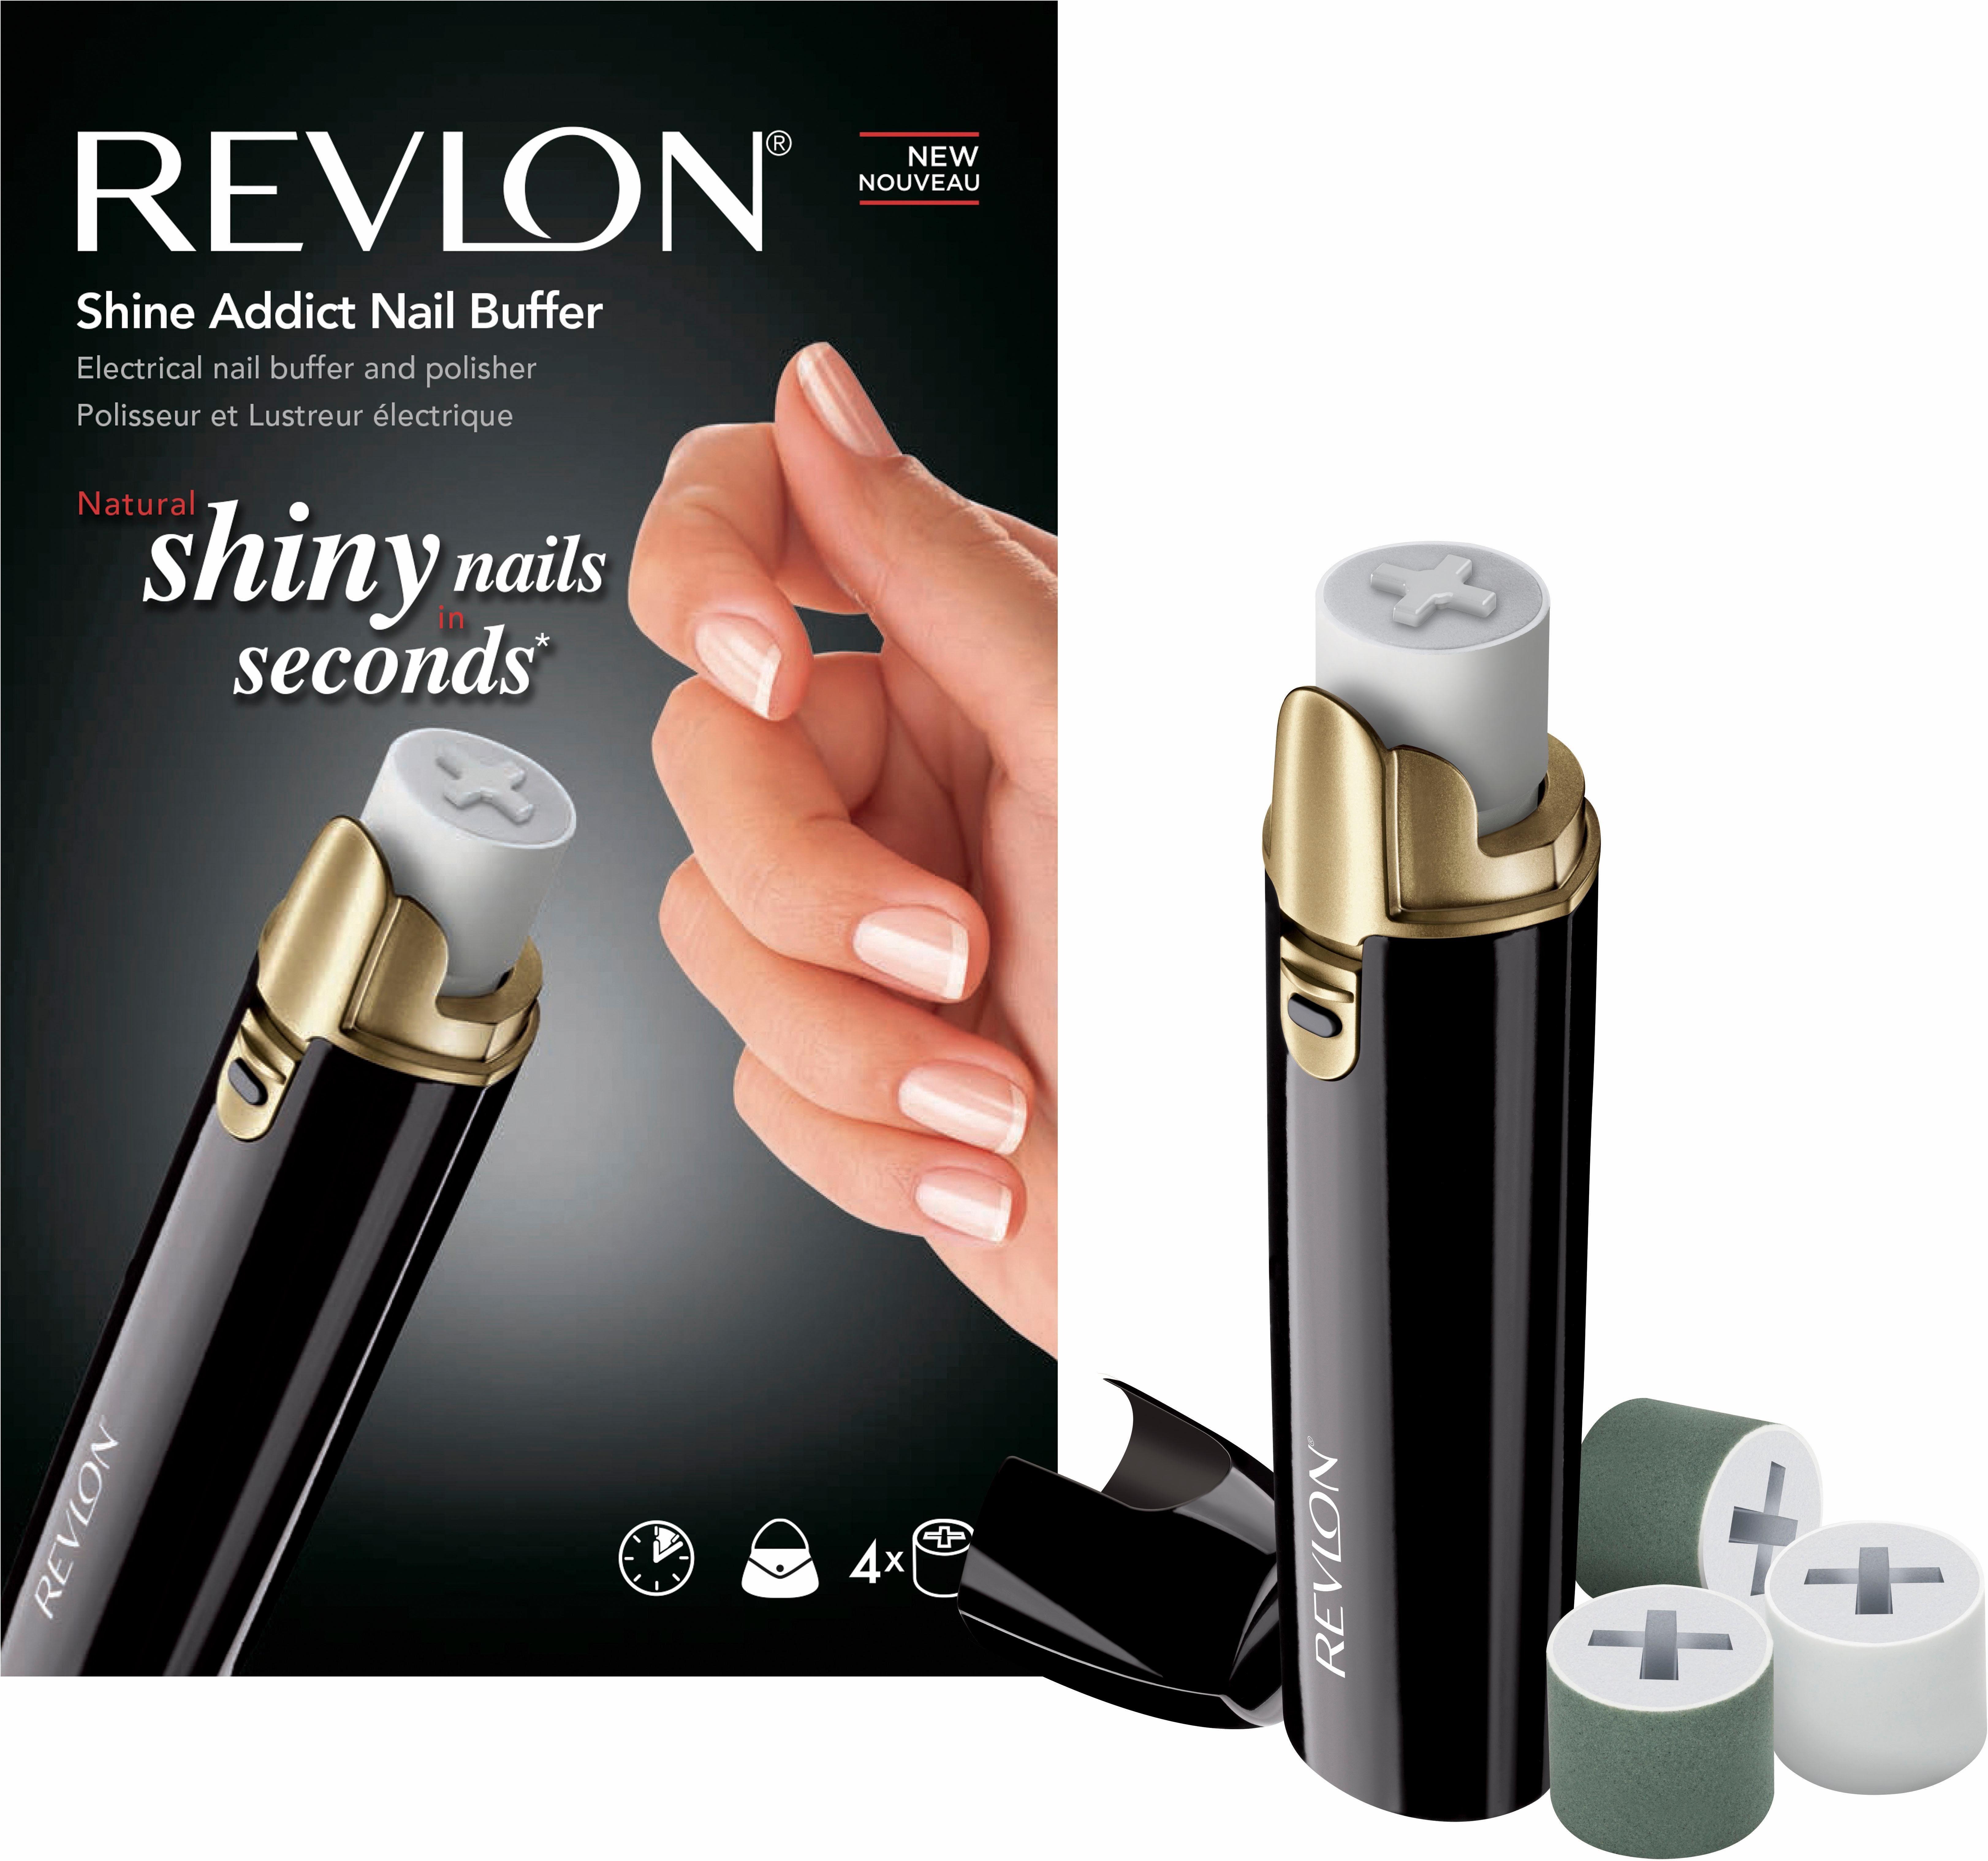 Revlon® Pediküre/Maniküre-Gerät SHINE ADDICT elektr. Nagelpolierer, lang anhaltend glänzende N